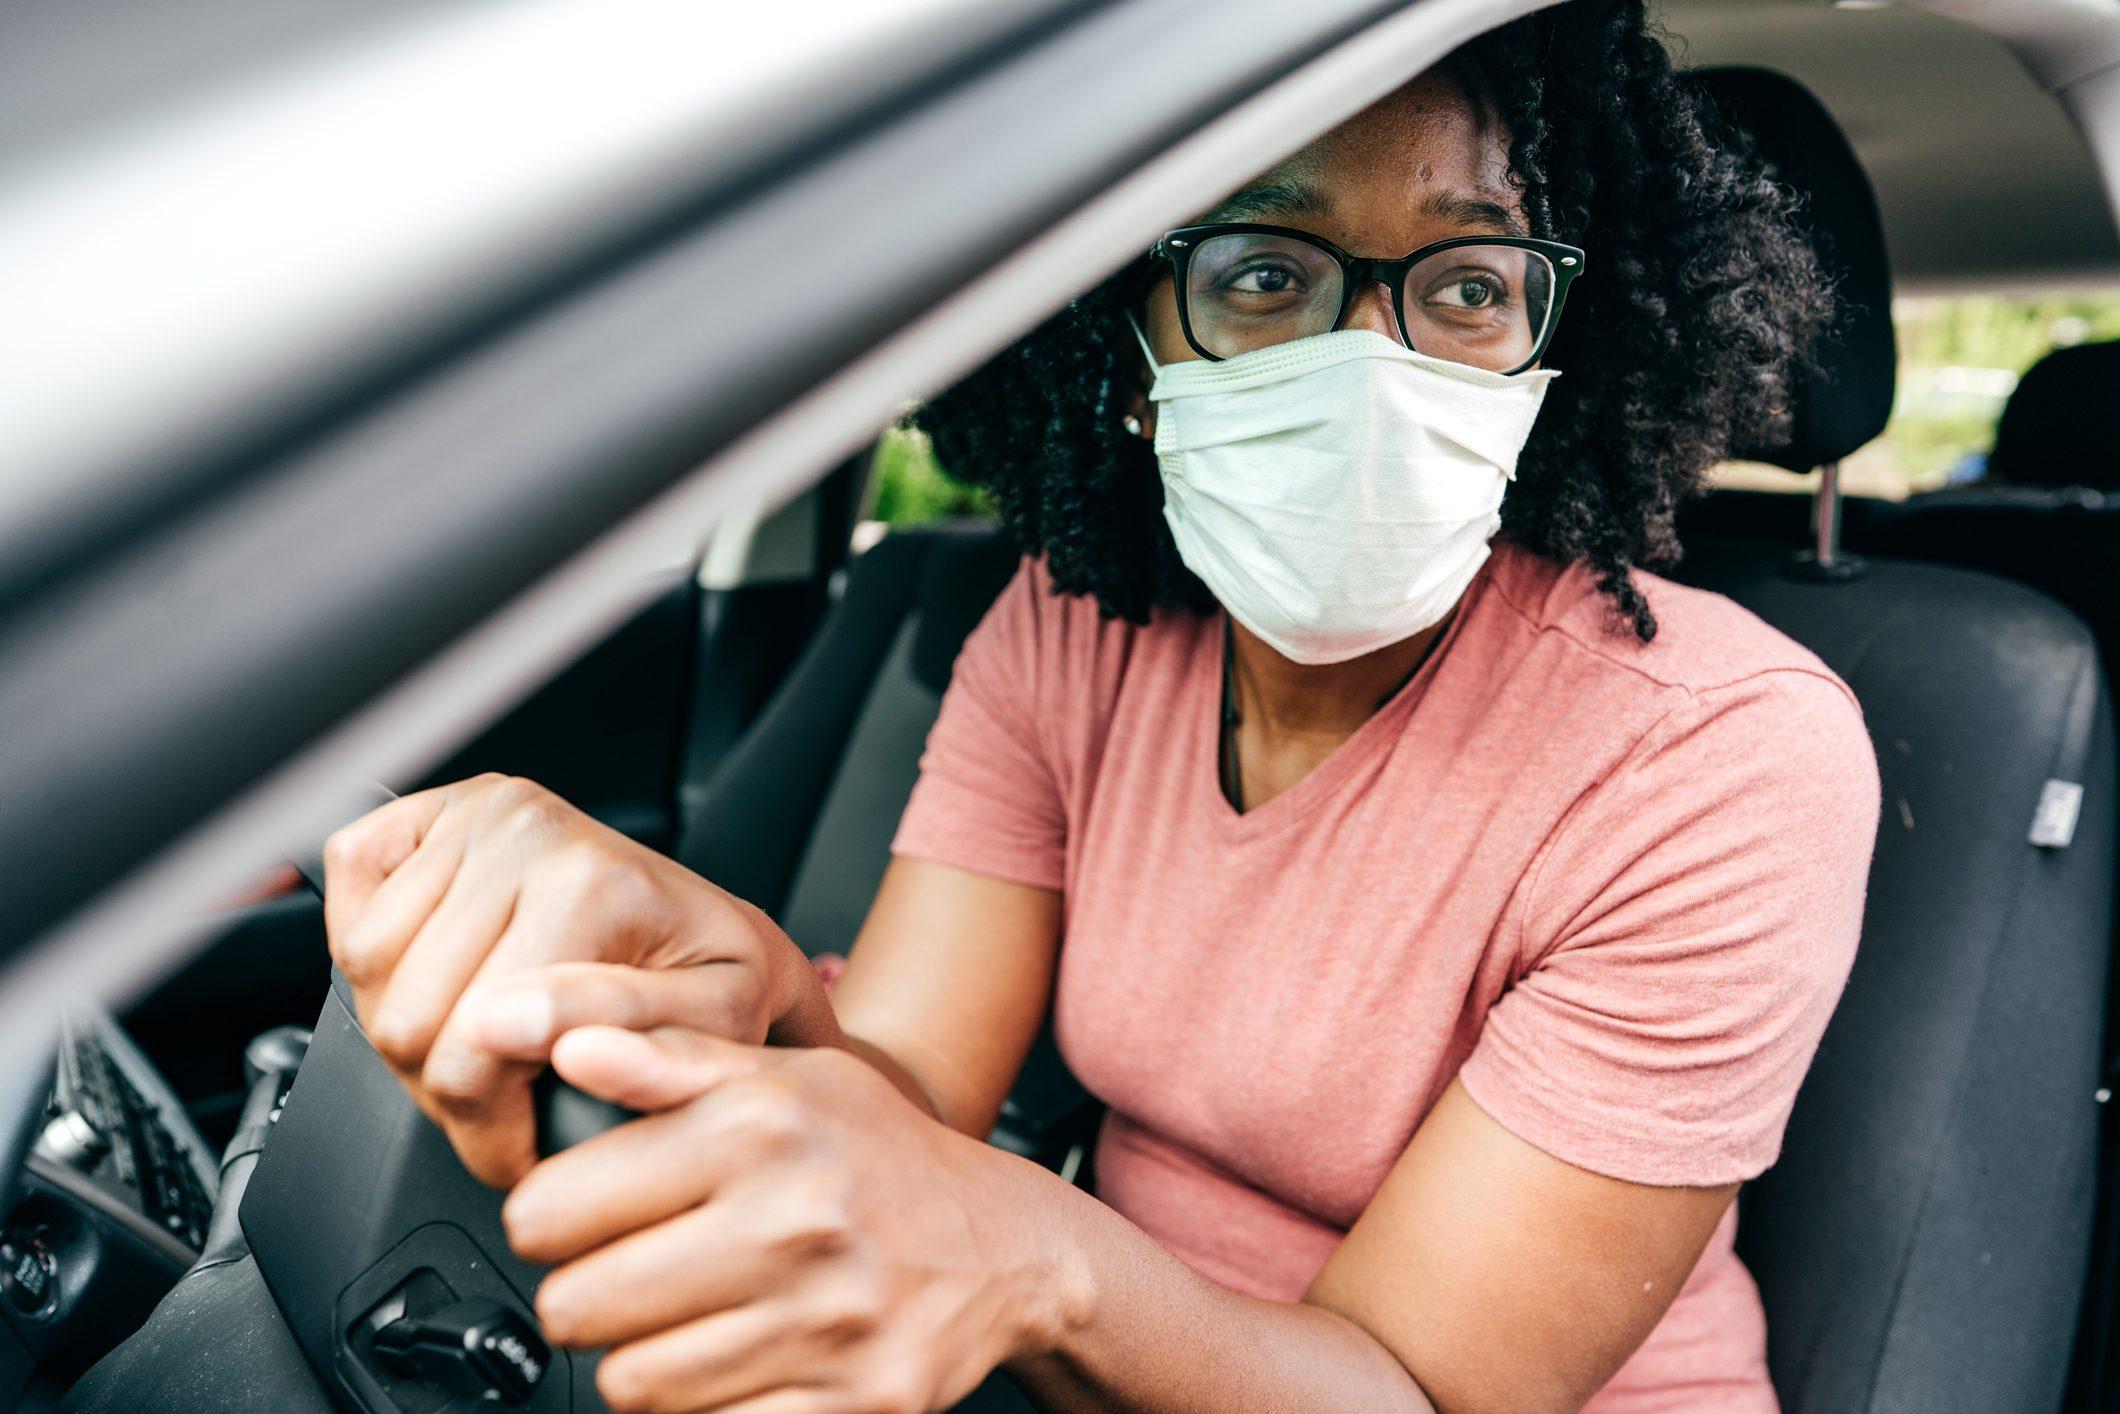 Wearing mask in car